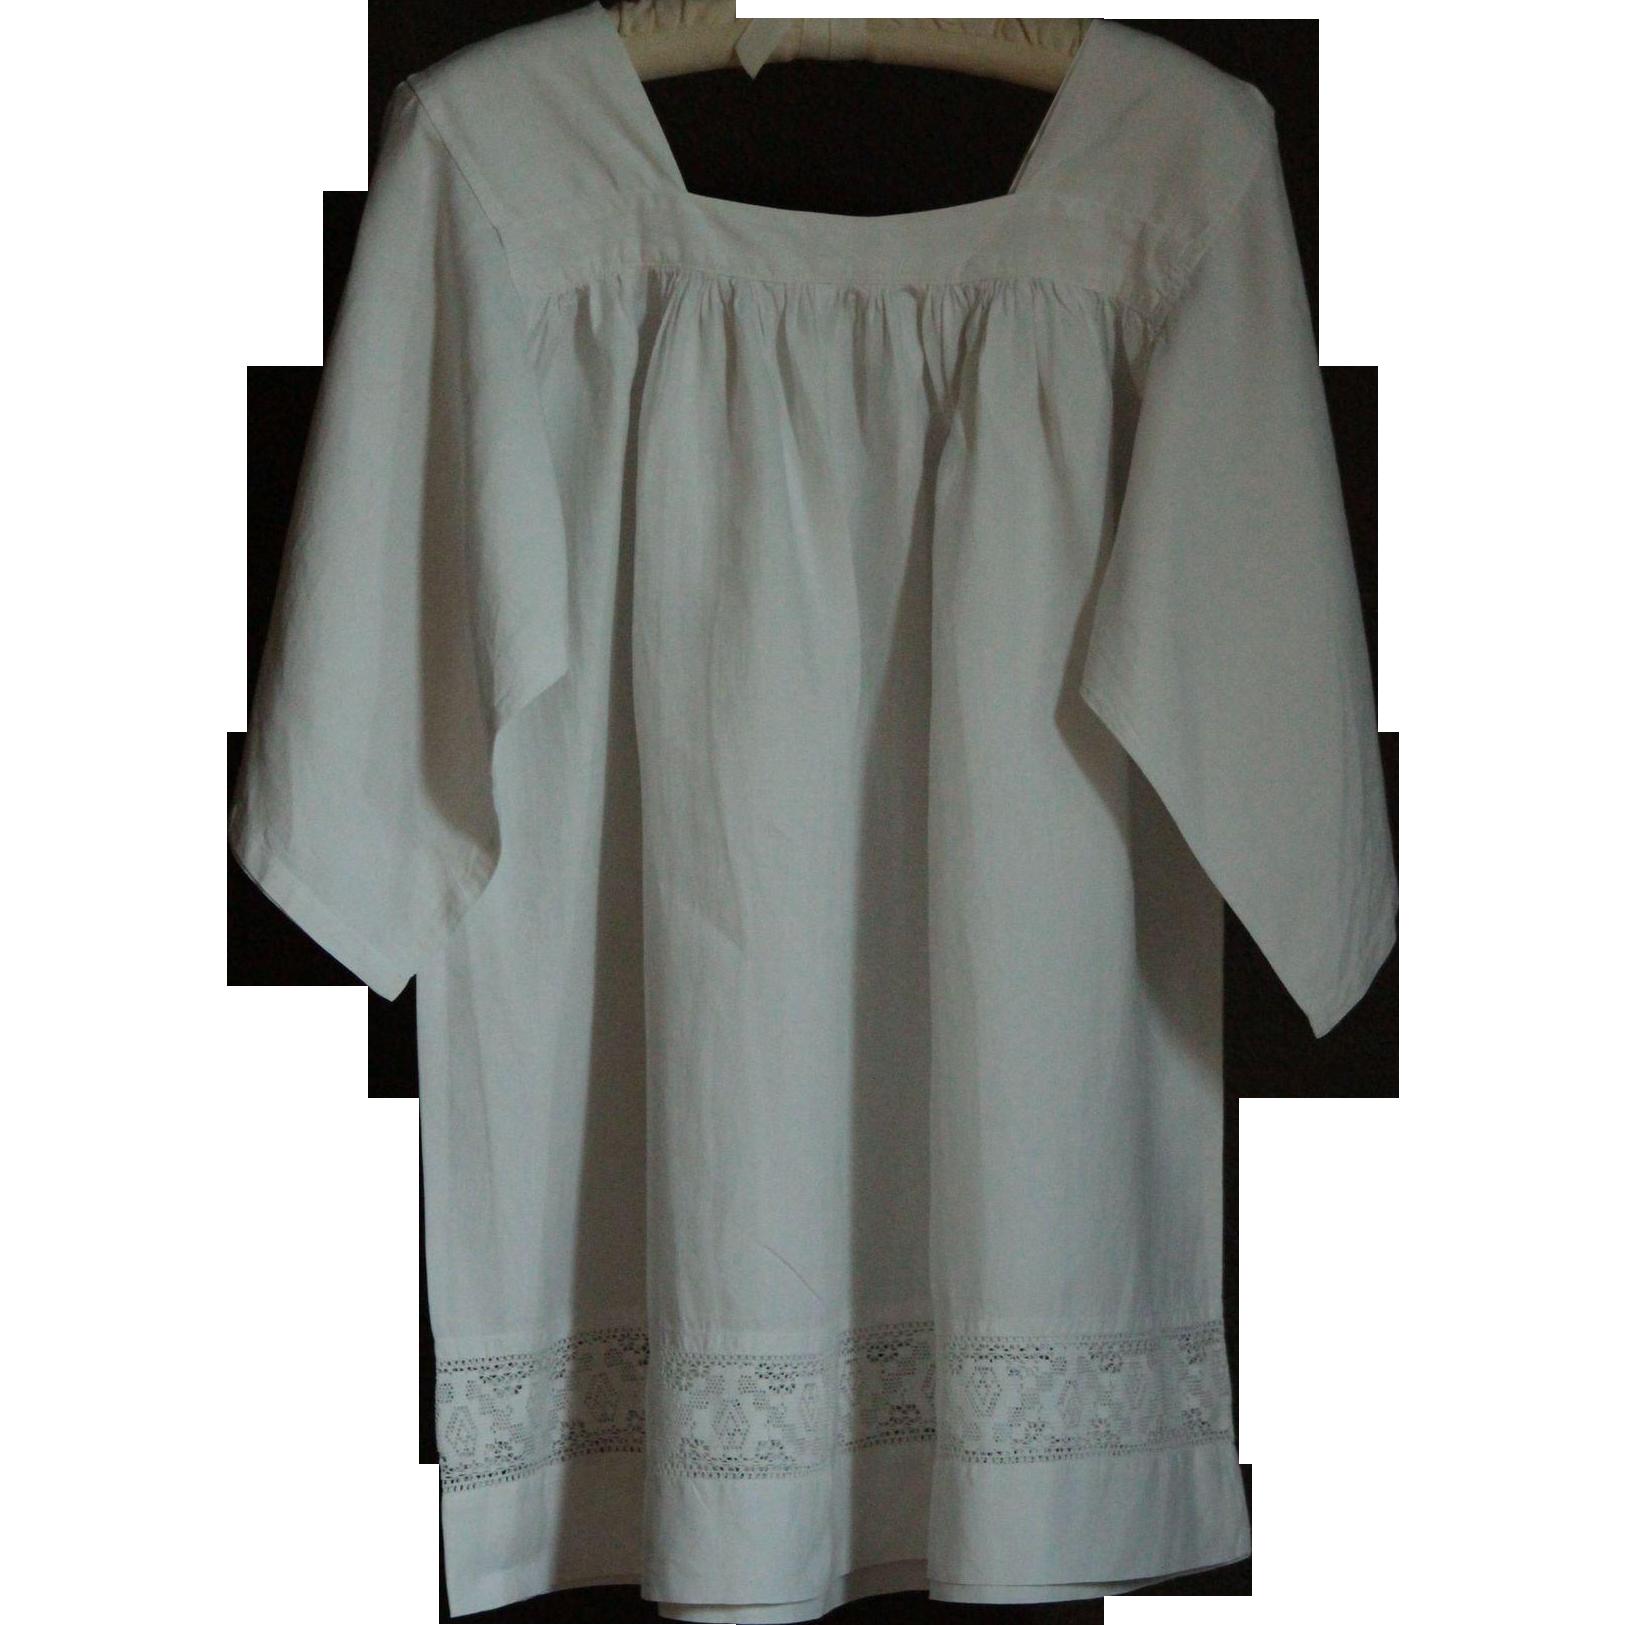 Antique Linen Vestment - Surplice - Religious Church Robe